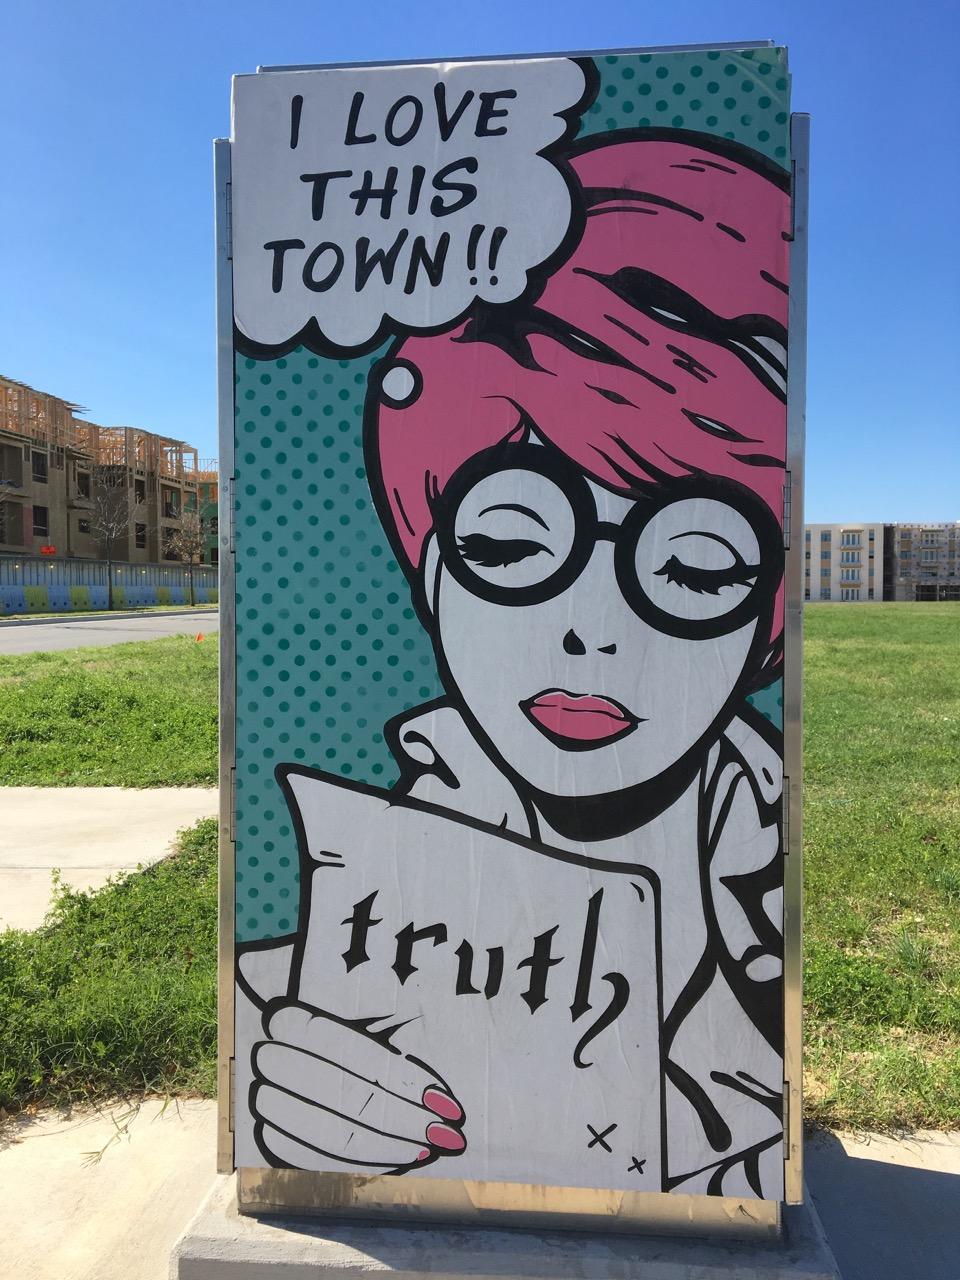 Street Art Homage to Pop Art and Austin